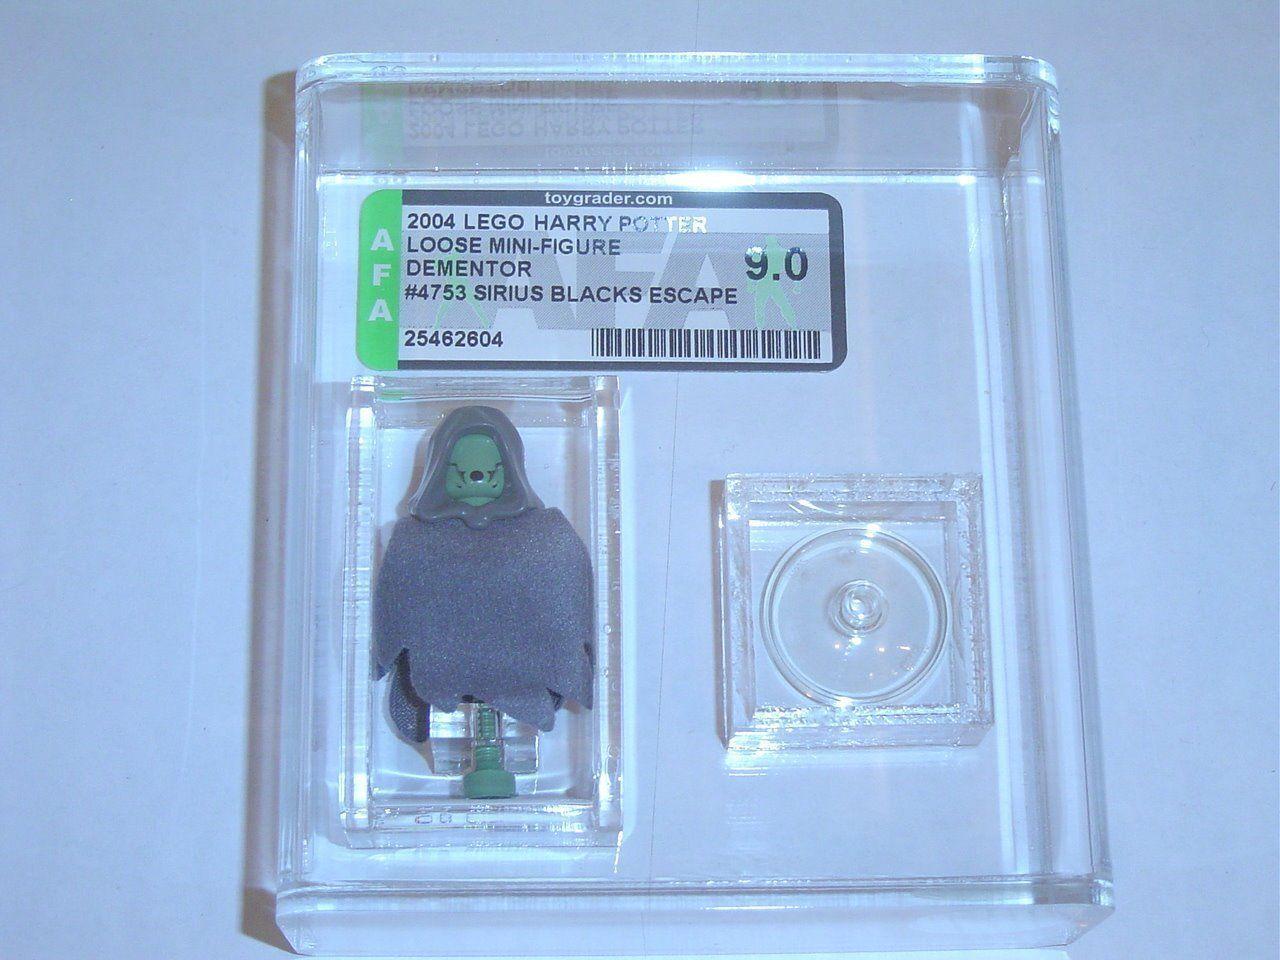 Lego 2004 Harry Potter Dementor Set 4753 GRADED AFA 9.00 - F32 NEW